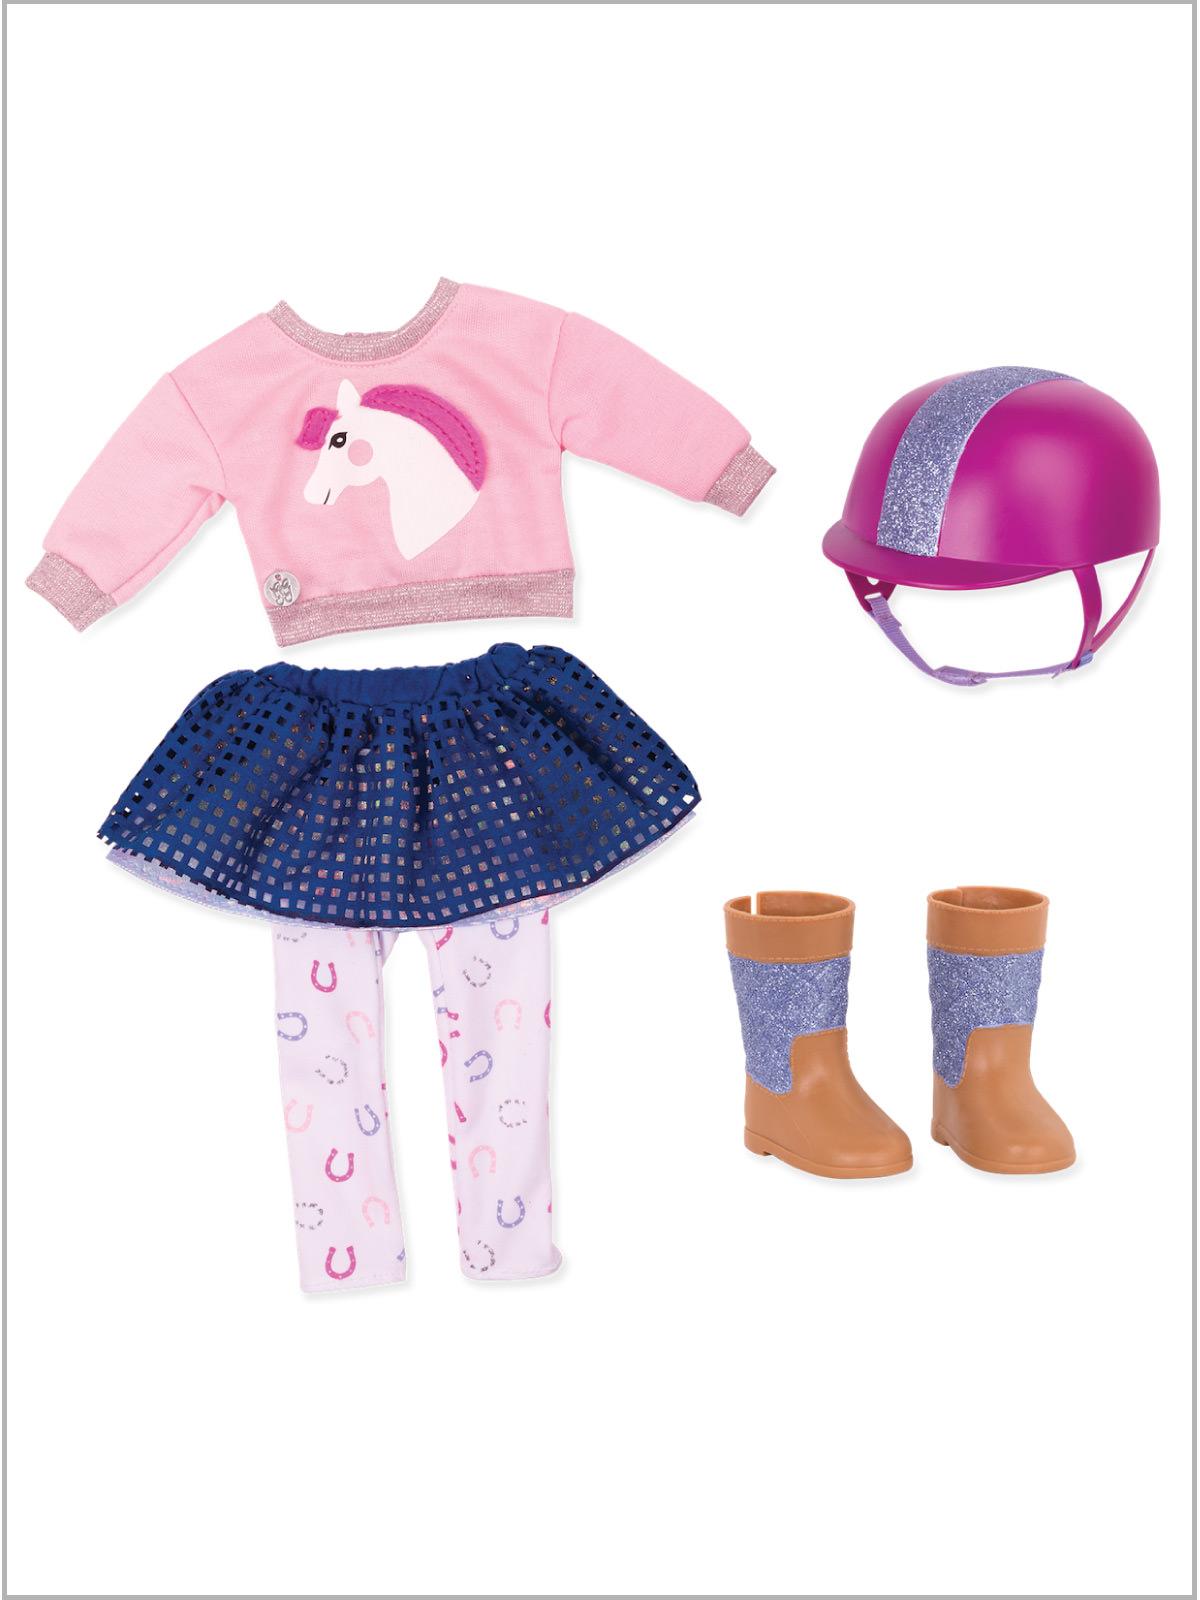 frederickandsophie-glittergirls-gallopandglow-outfit